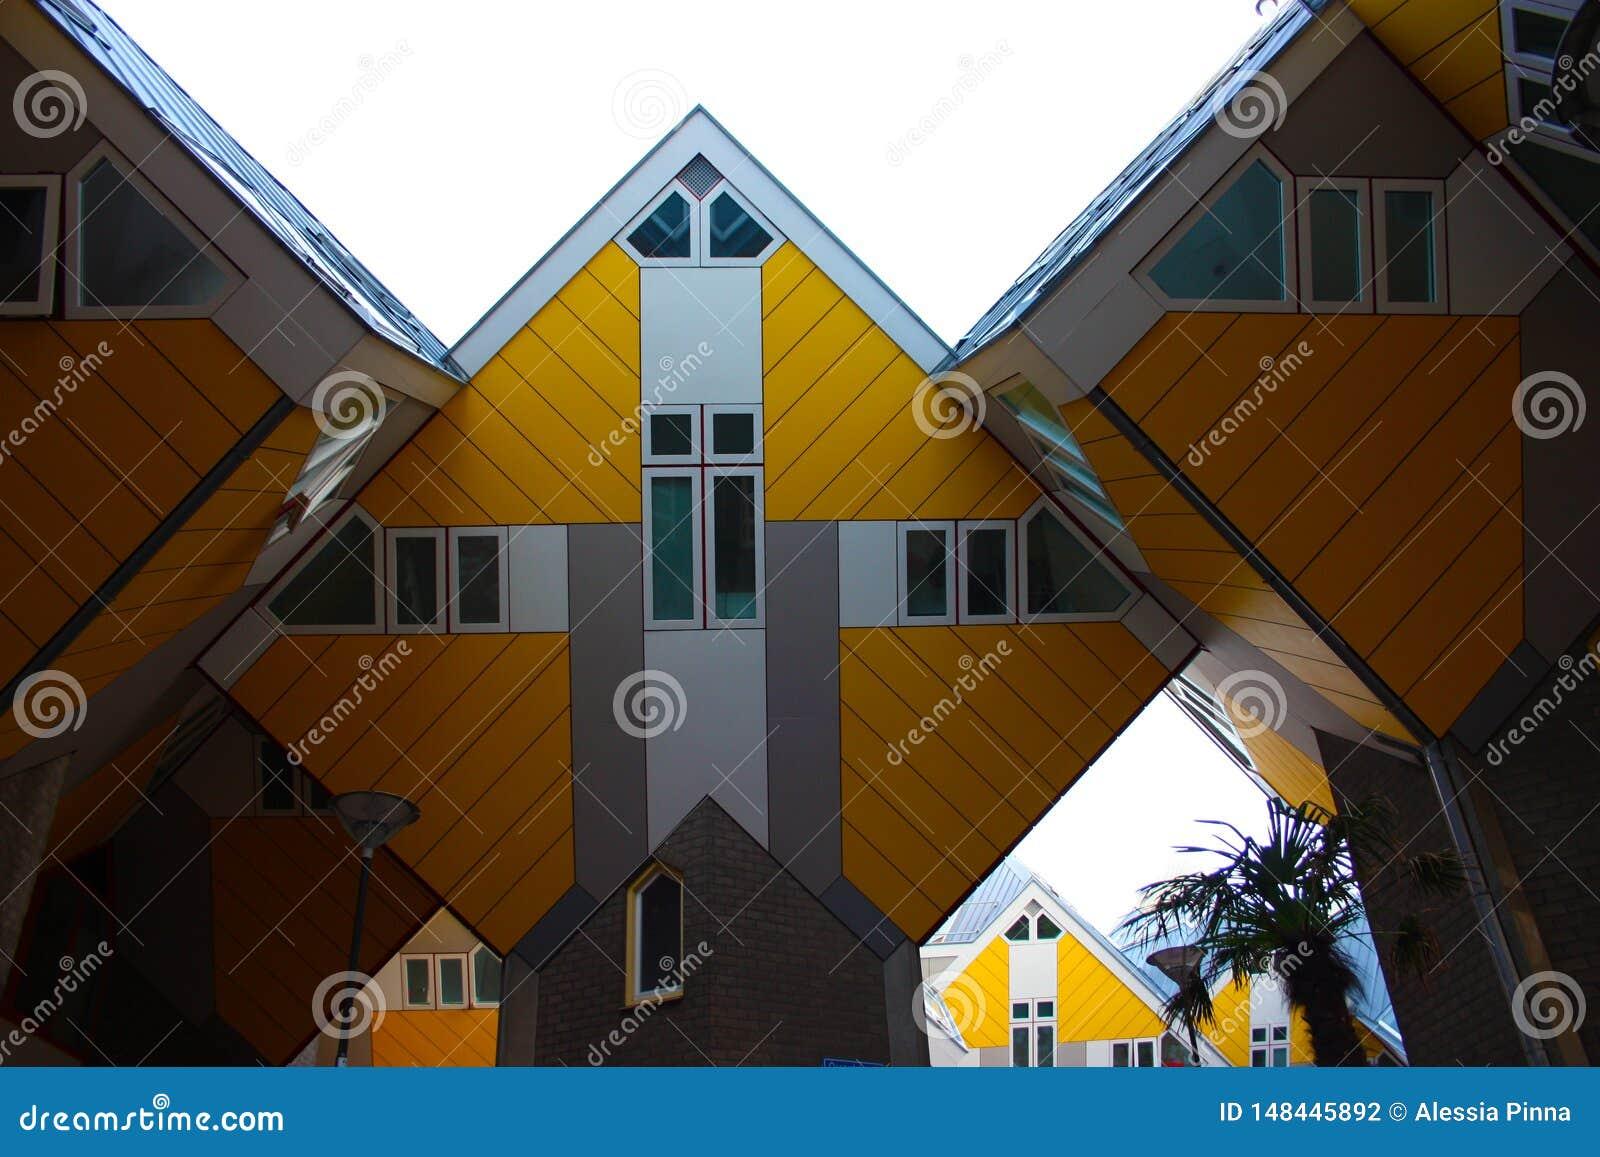 Apartamentos e escrit?rios dentro das casas c?bicas de Rotterdam, cidade metropolitana